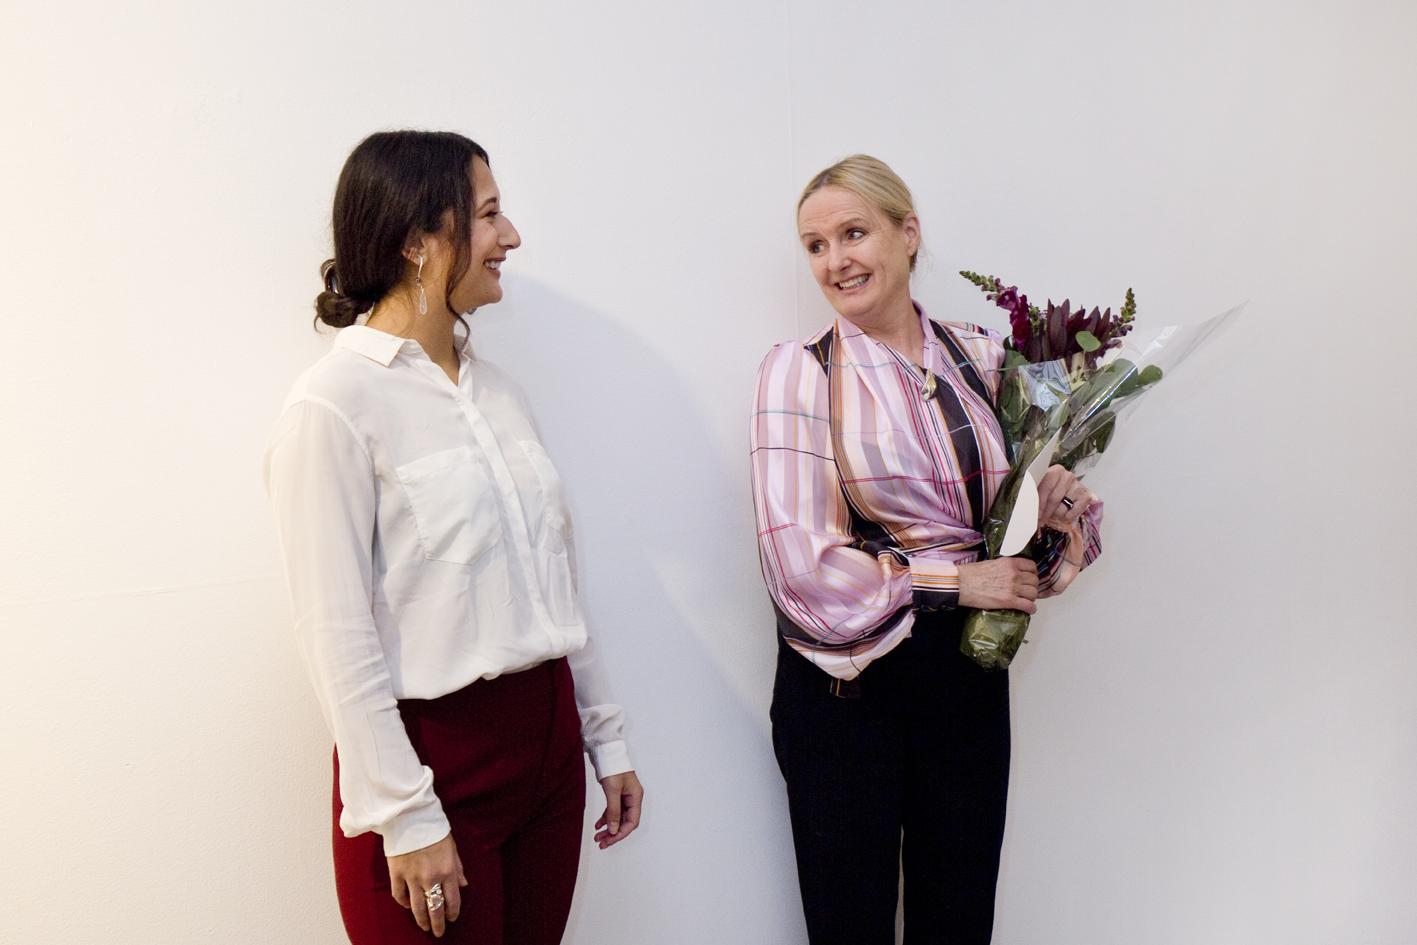 Mariella Yakubu and Marianne Bergskaug (NAJD)